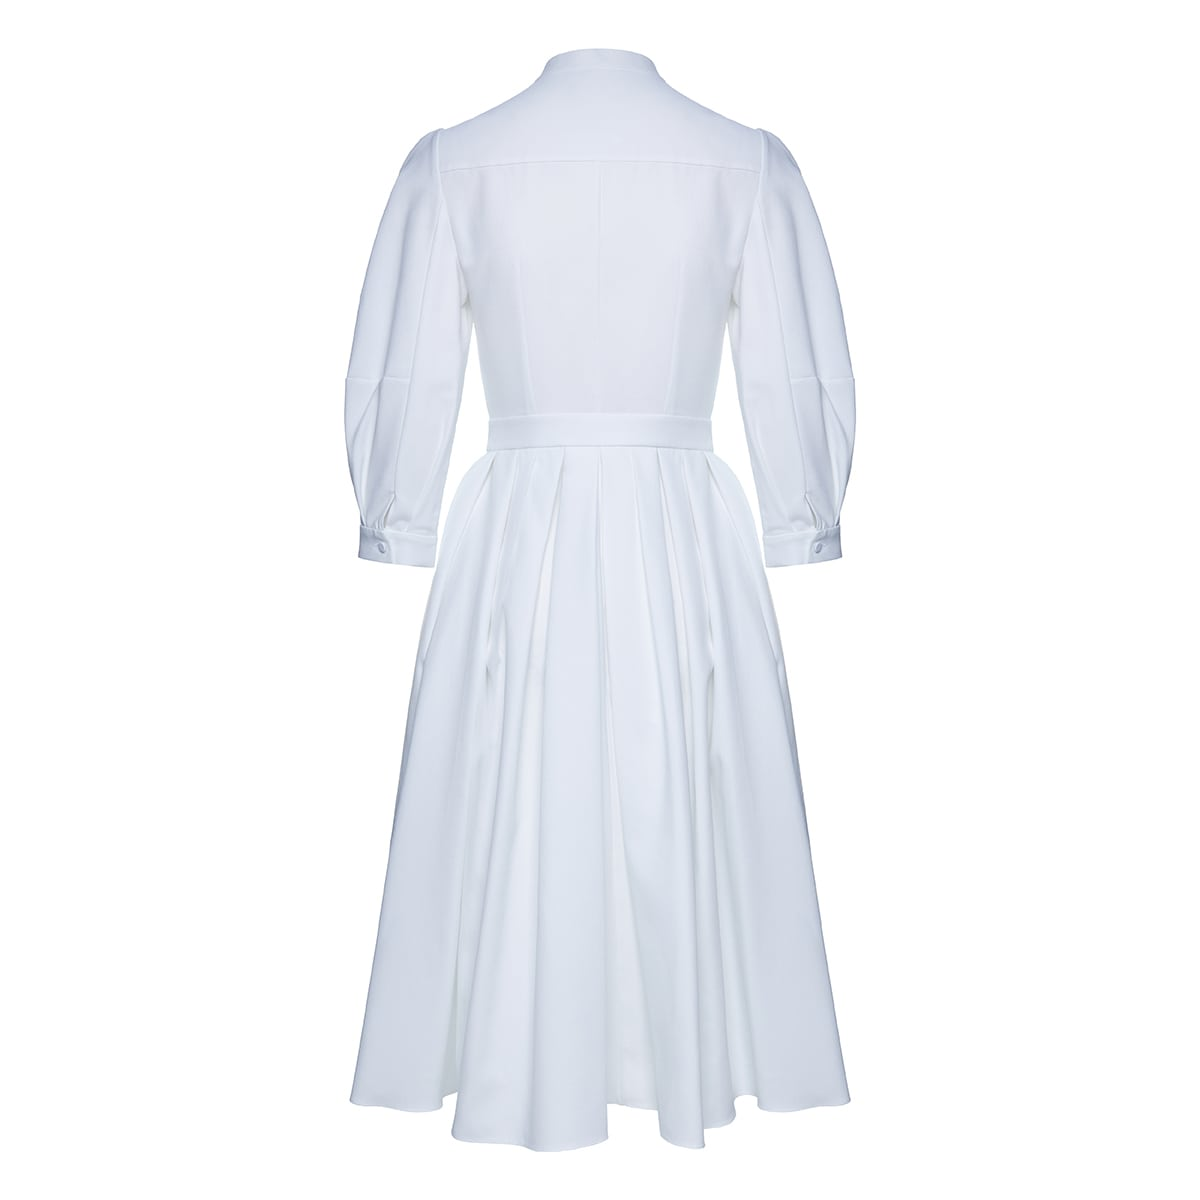 Pleated flared shirt dress